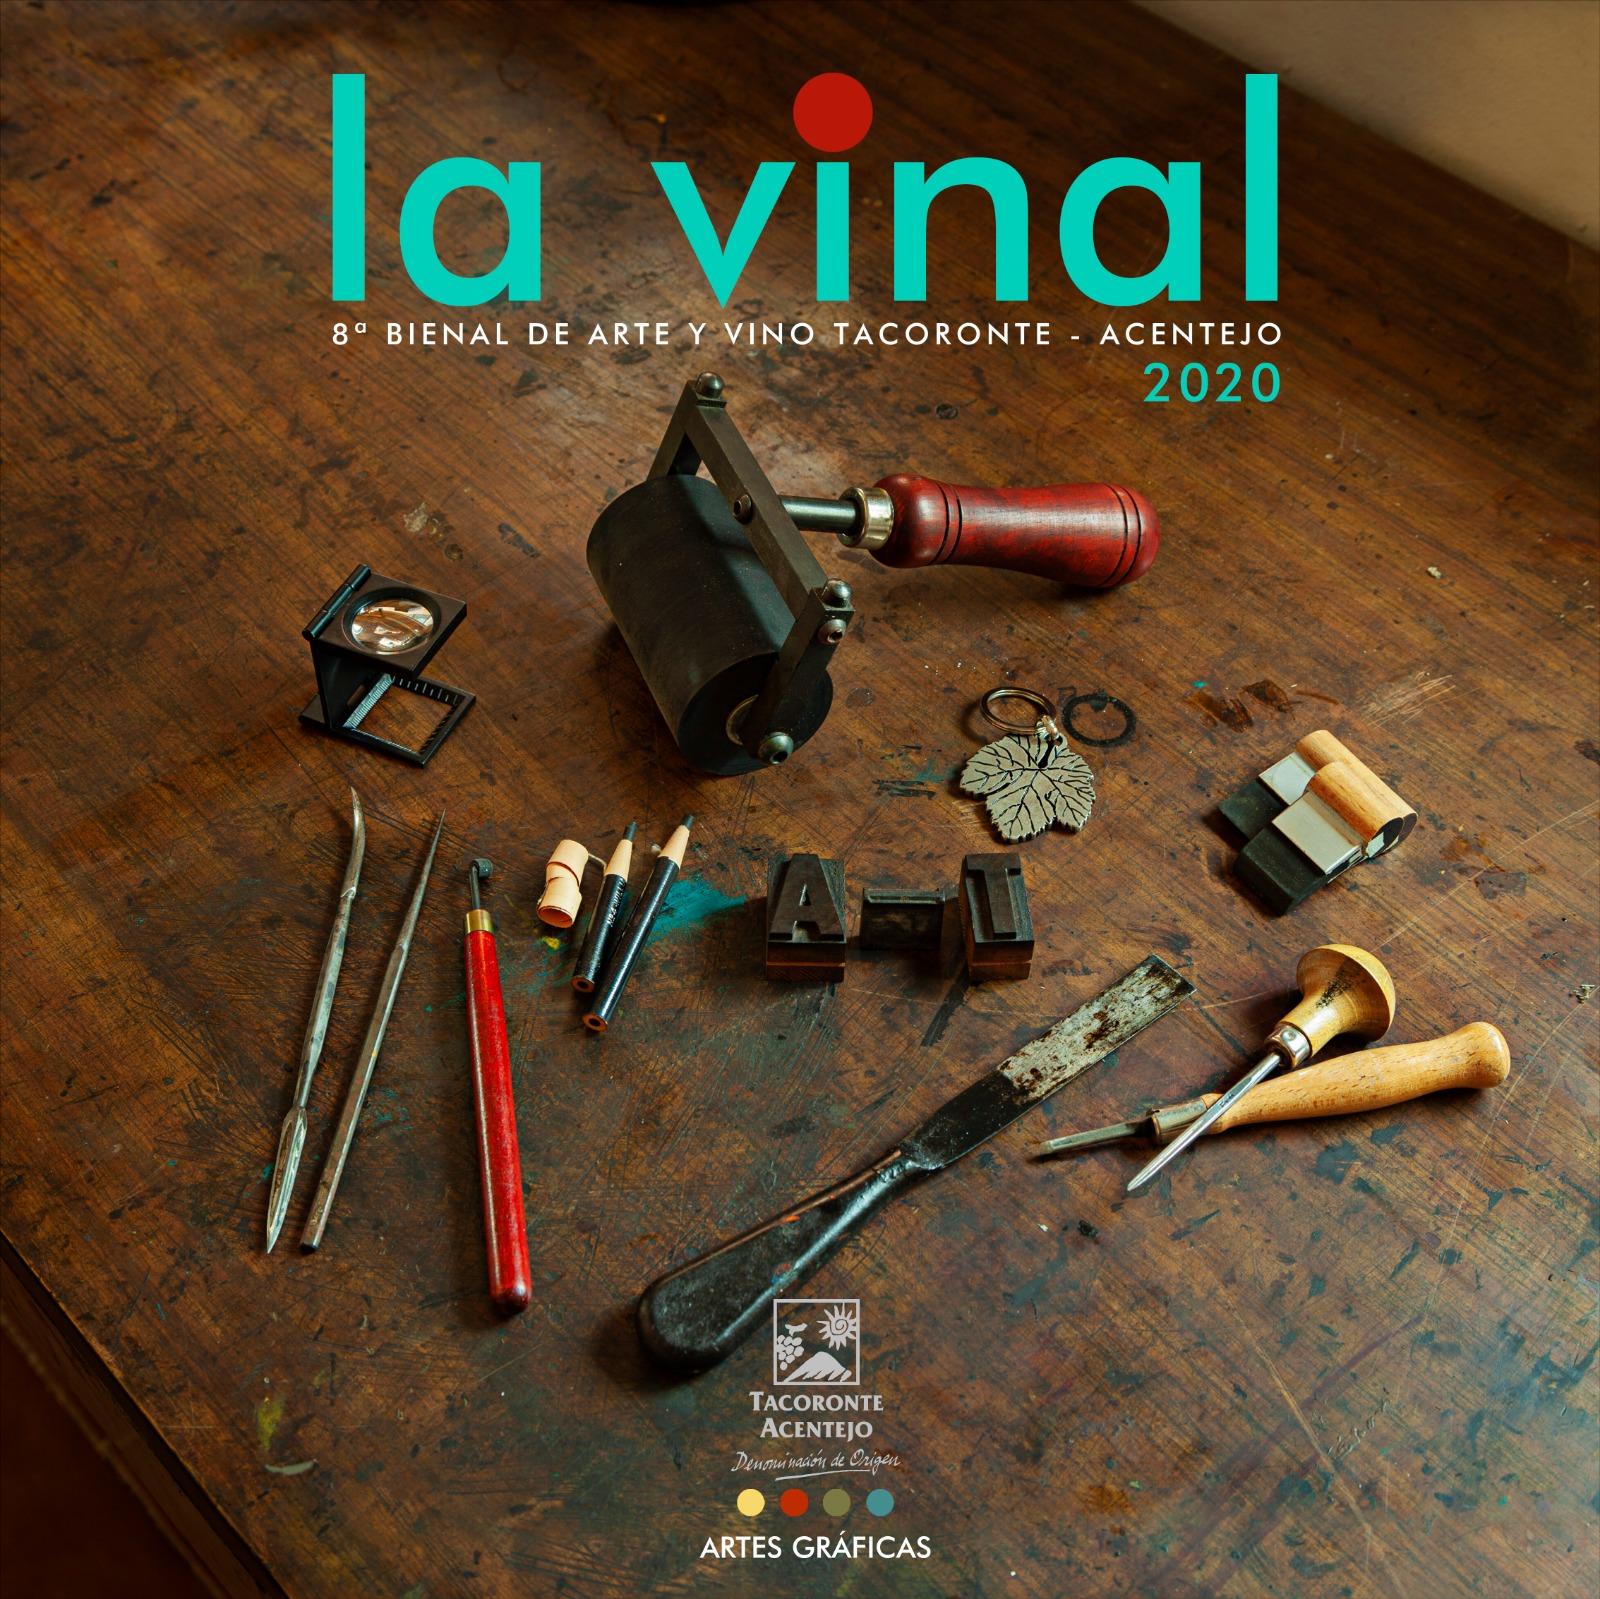 Catálogo La Vinal Tacoronte-Acentejo disponible on-line